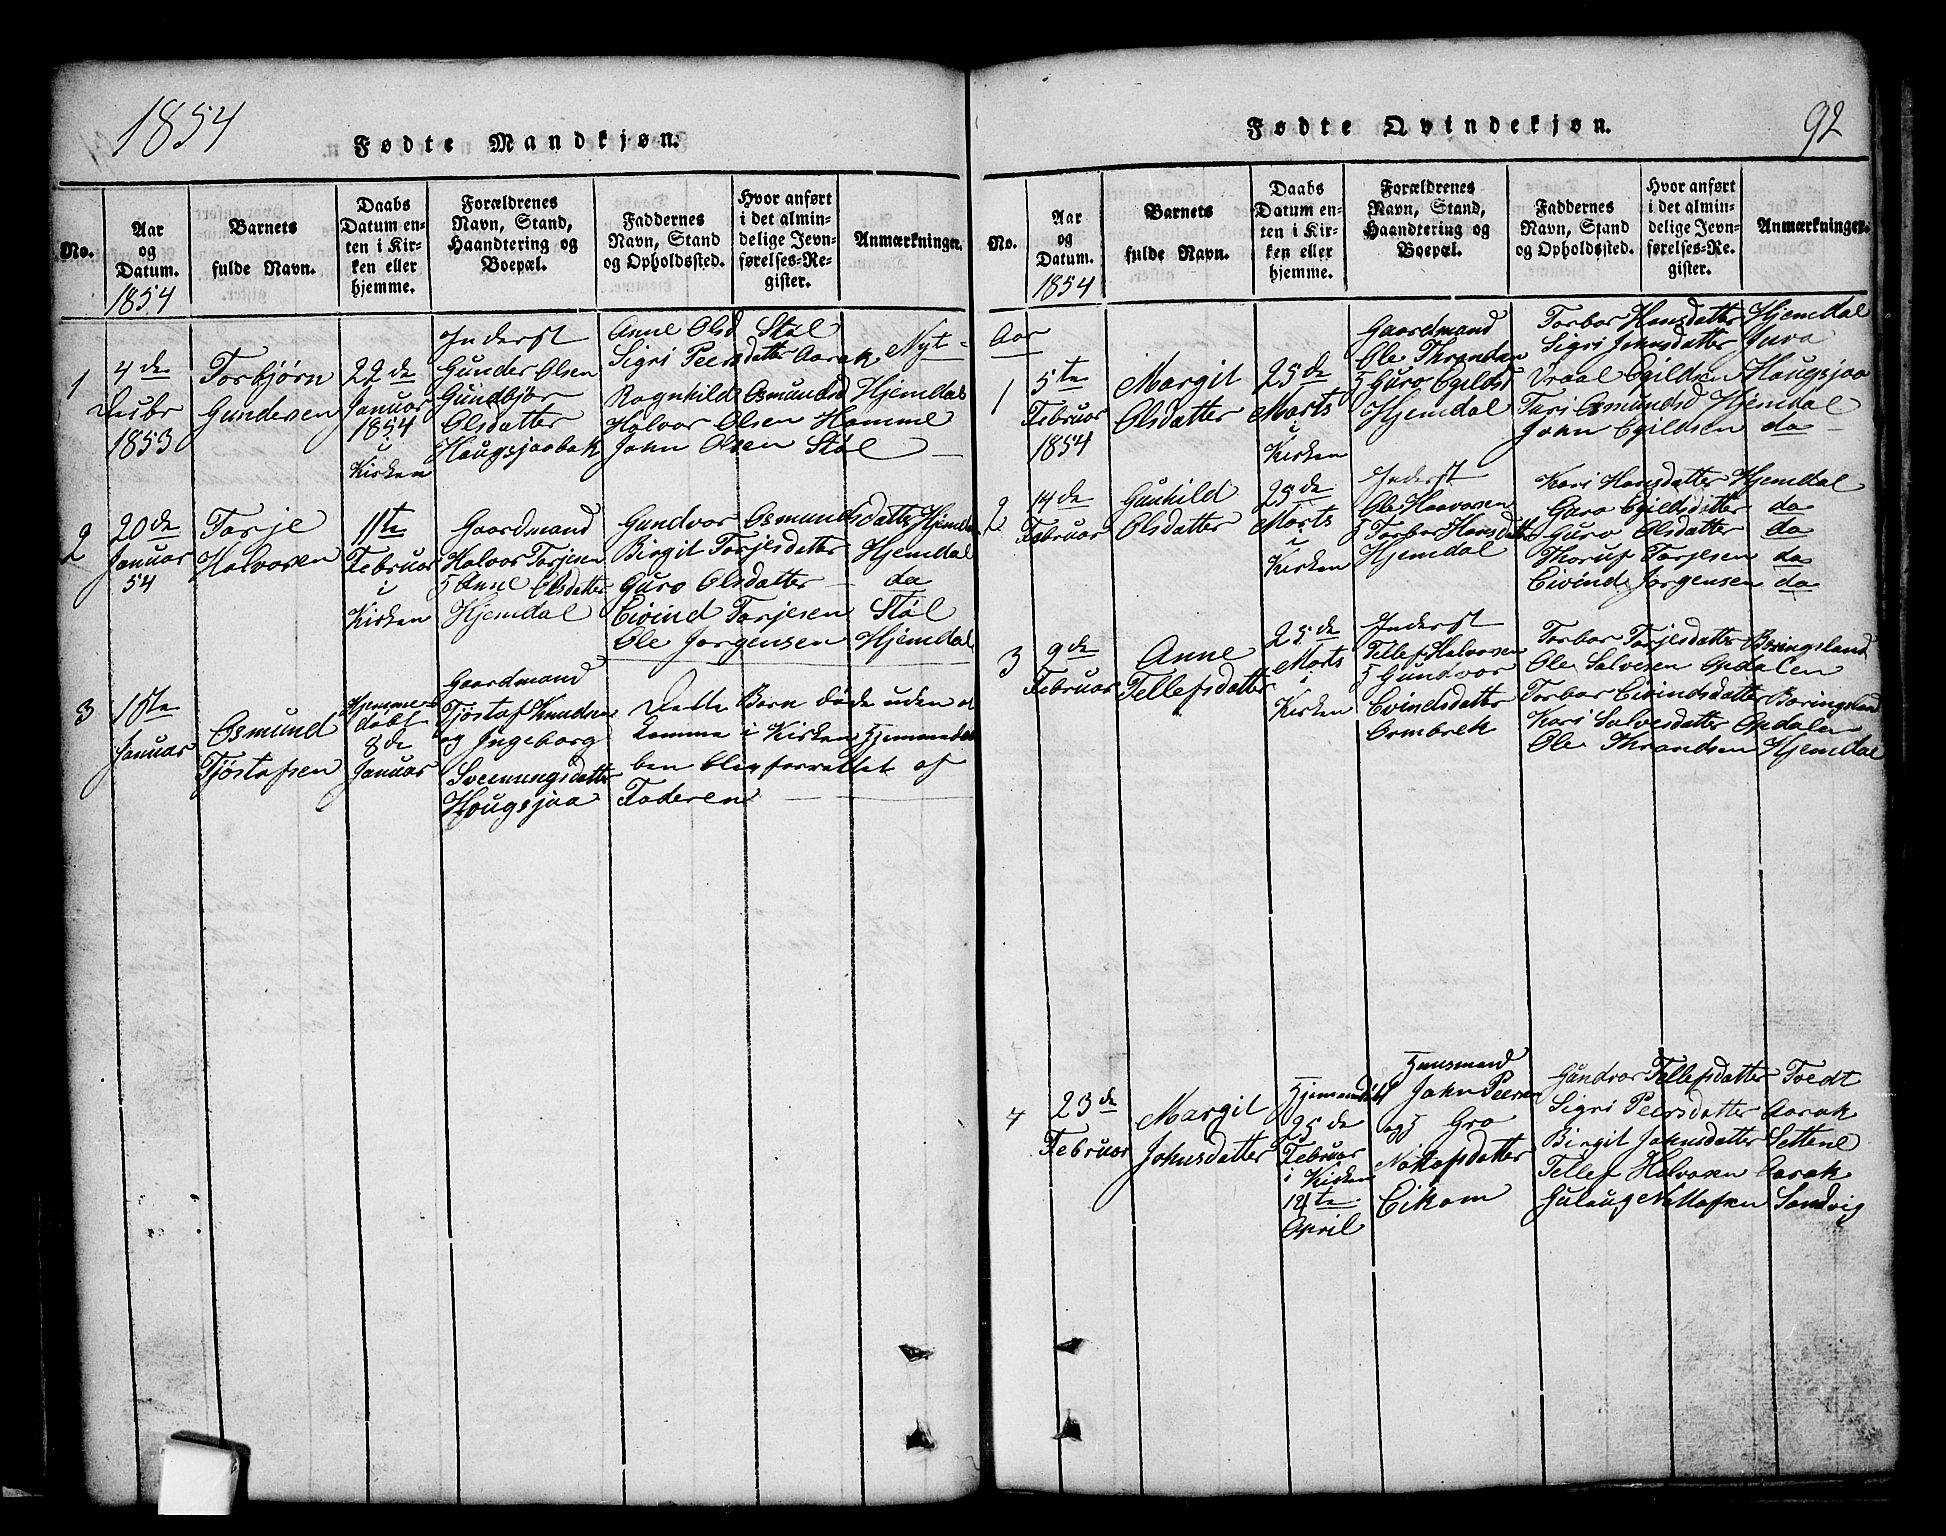 SAKO, Nissedal kirkebøker, G/Gb/L0001: Klokkerbok nr. II 1, 1814-1862, s. 92